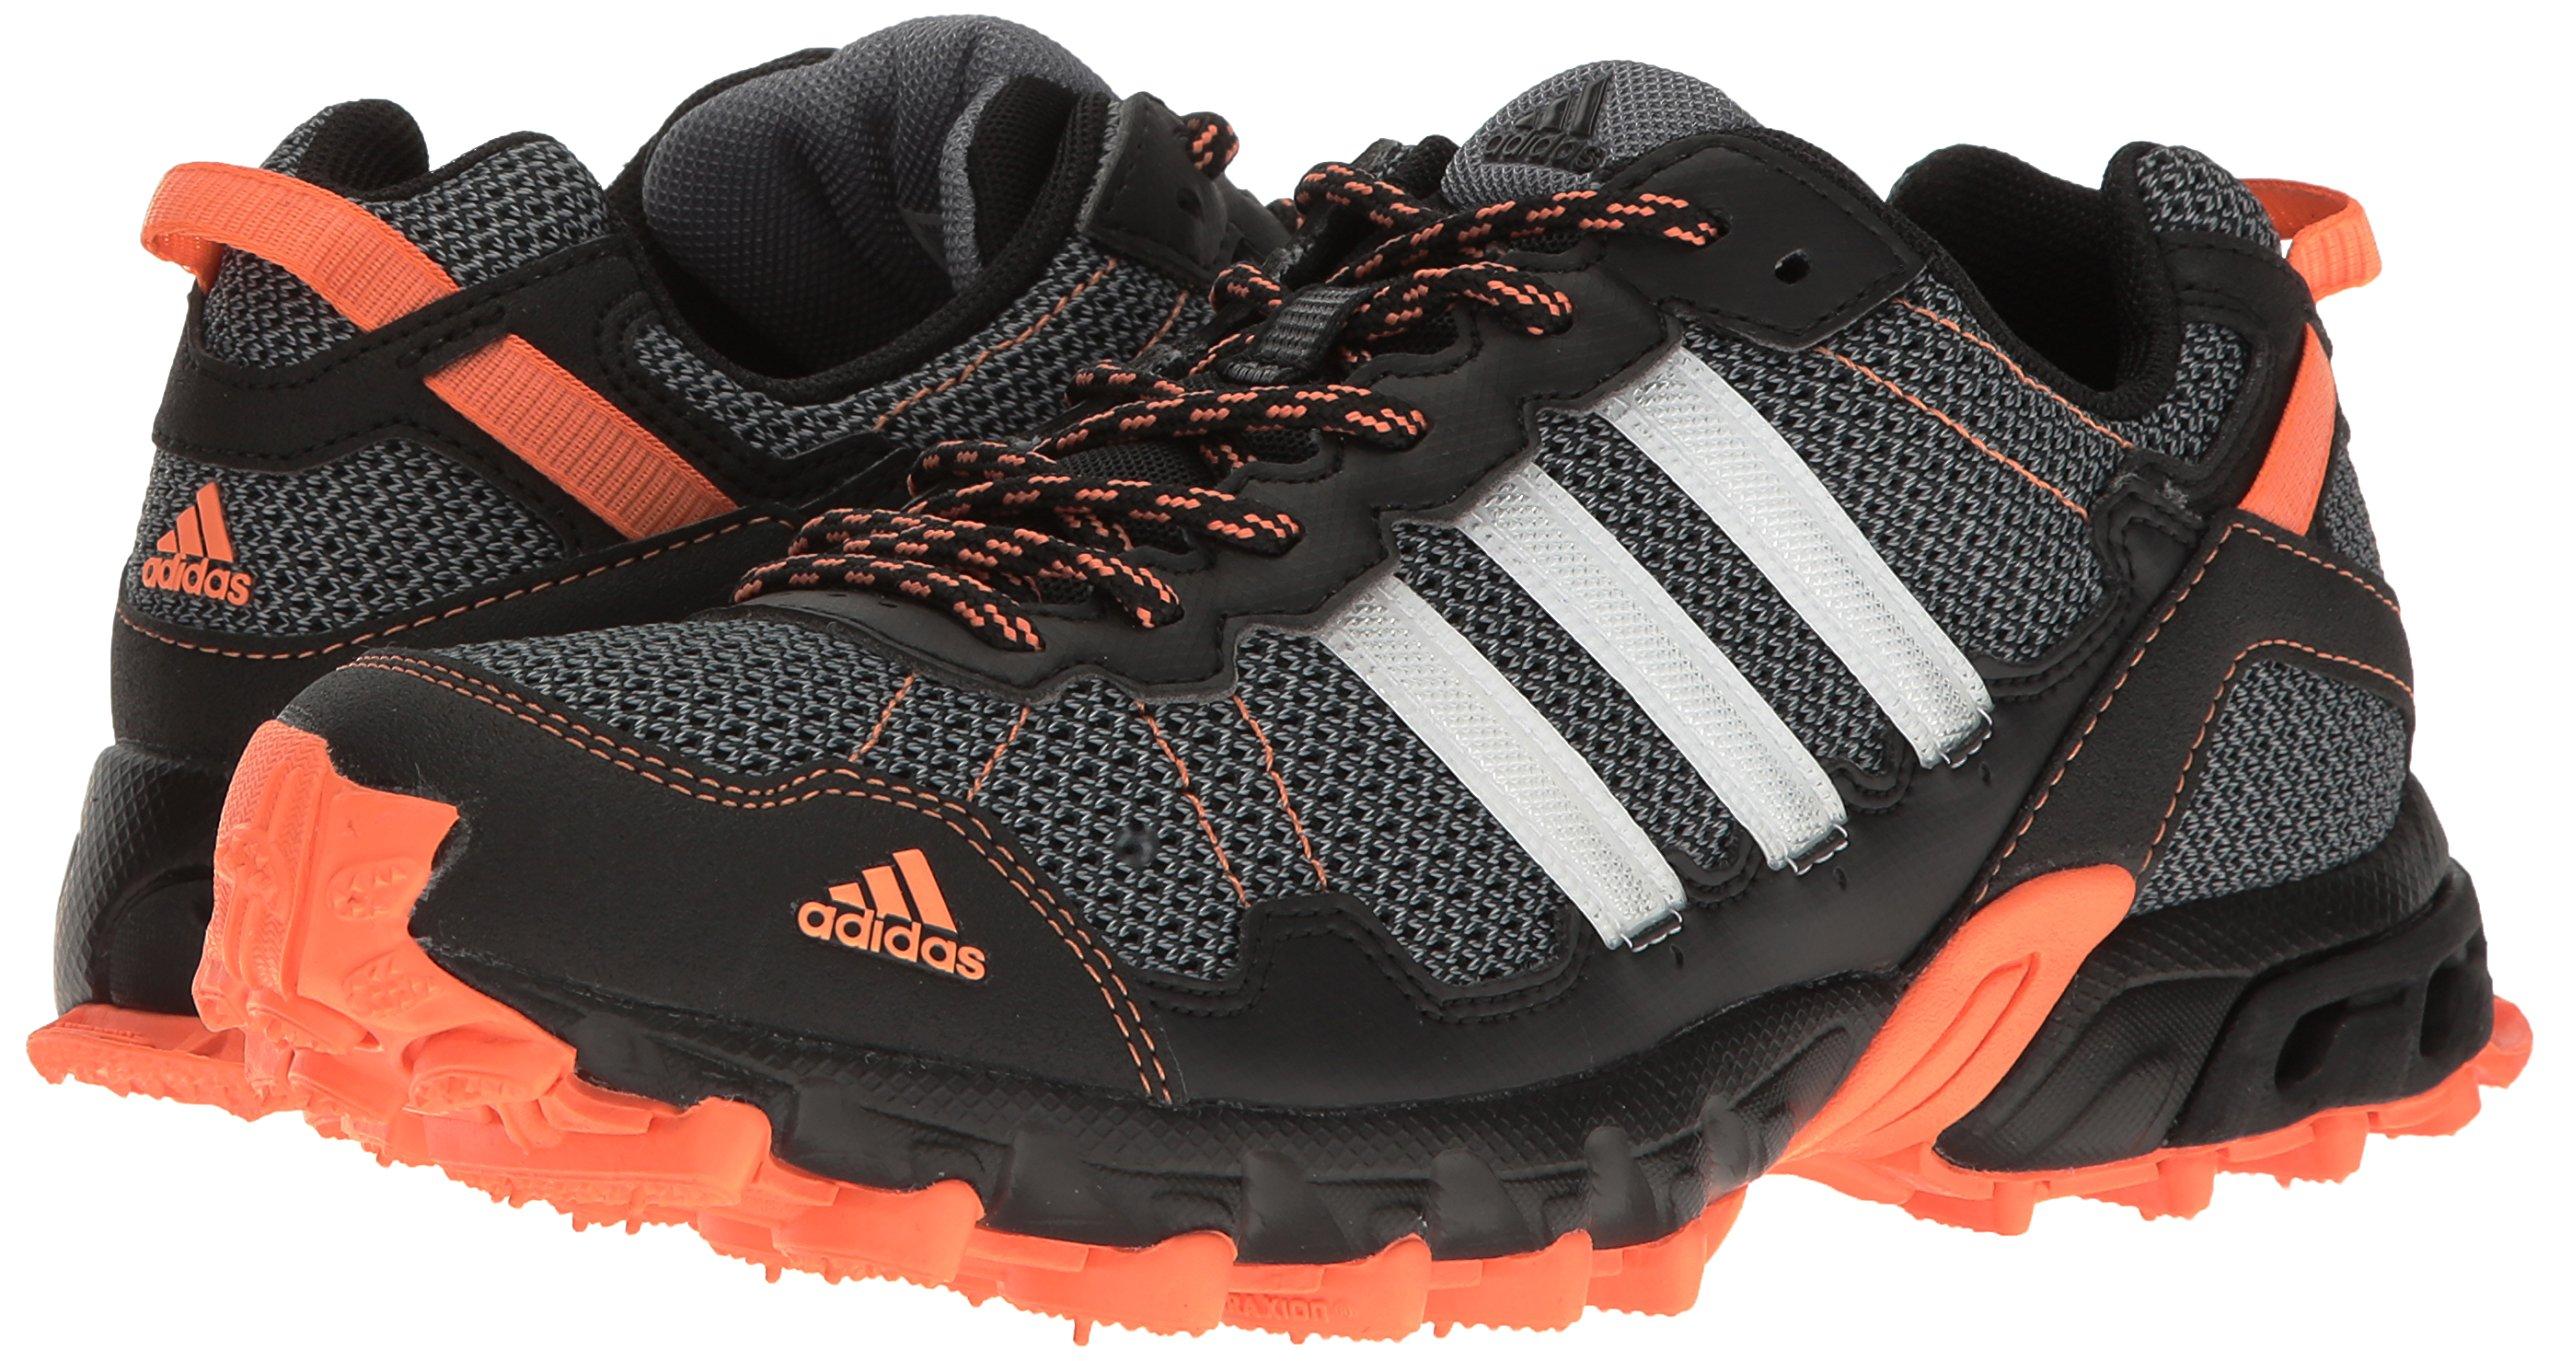 adidas Women's Rockadia Trail W Running Shoe Black/White/Easy Orange 6 M US by adidas (Image #6)